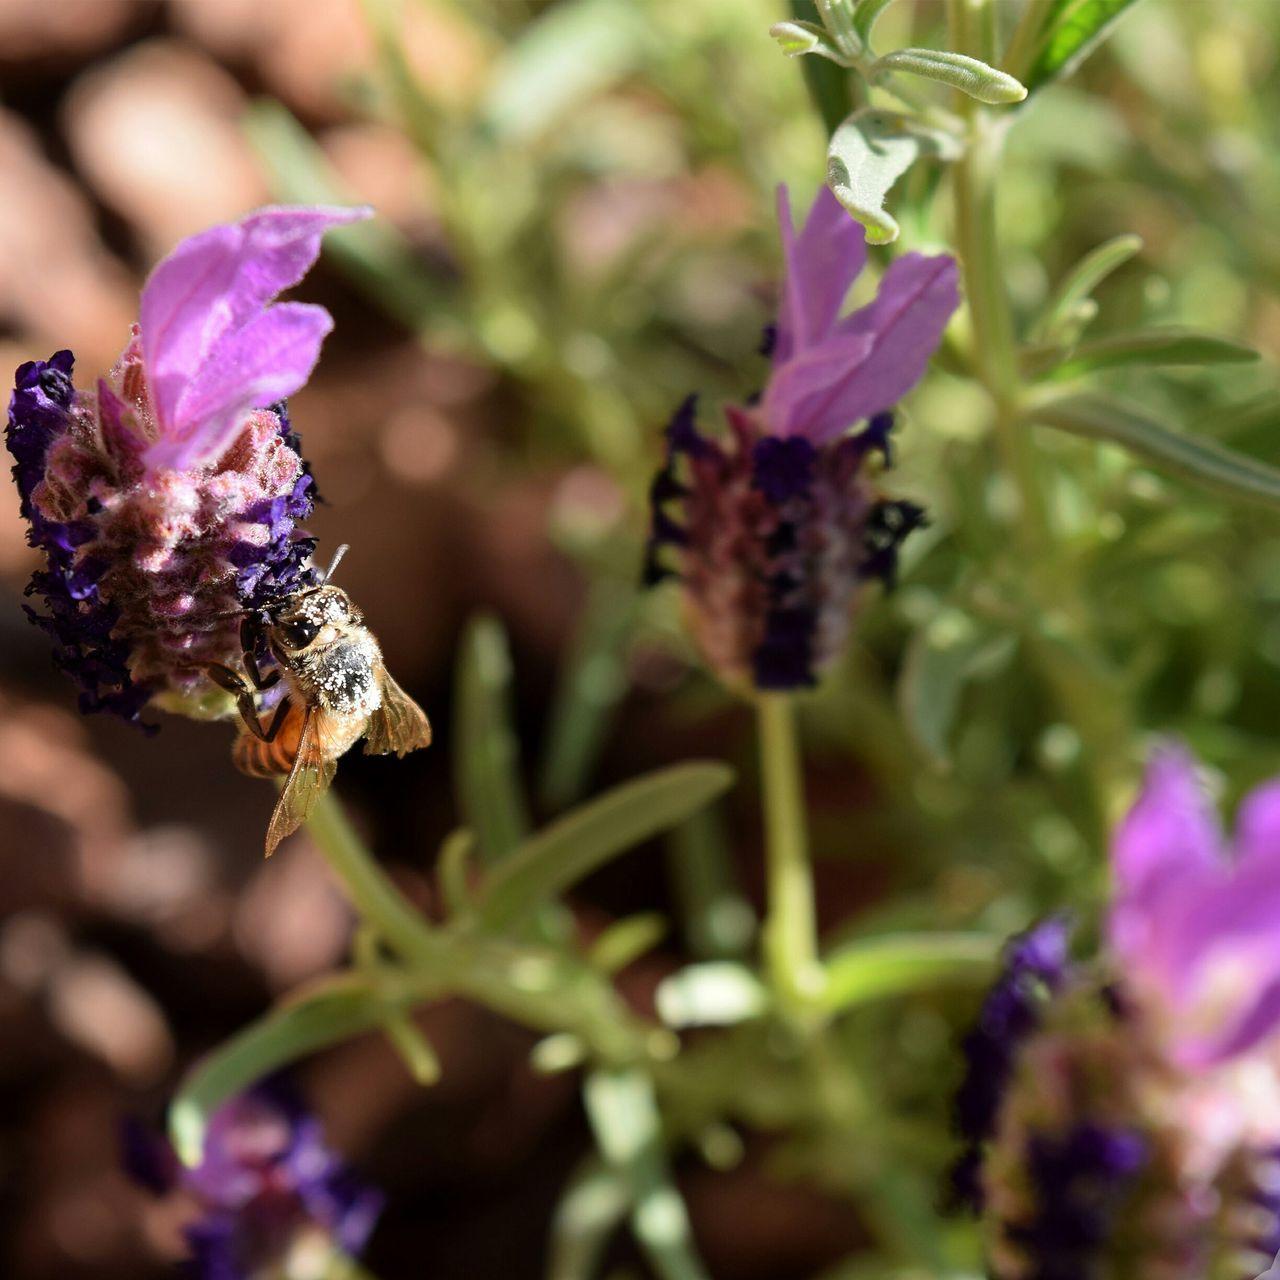 Bee-havior 2 Bees And Flowers Purple Nature Close-up HoneyBee Bee 🐝 First Eyeem Photo Blooming Love To Take Photos ❤ Love